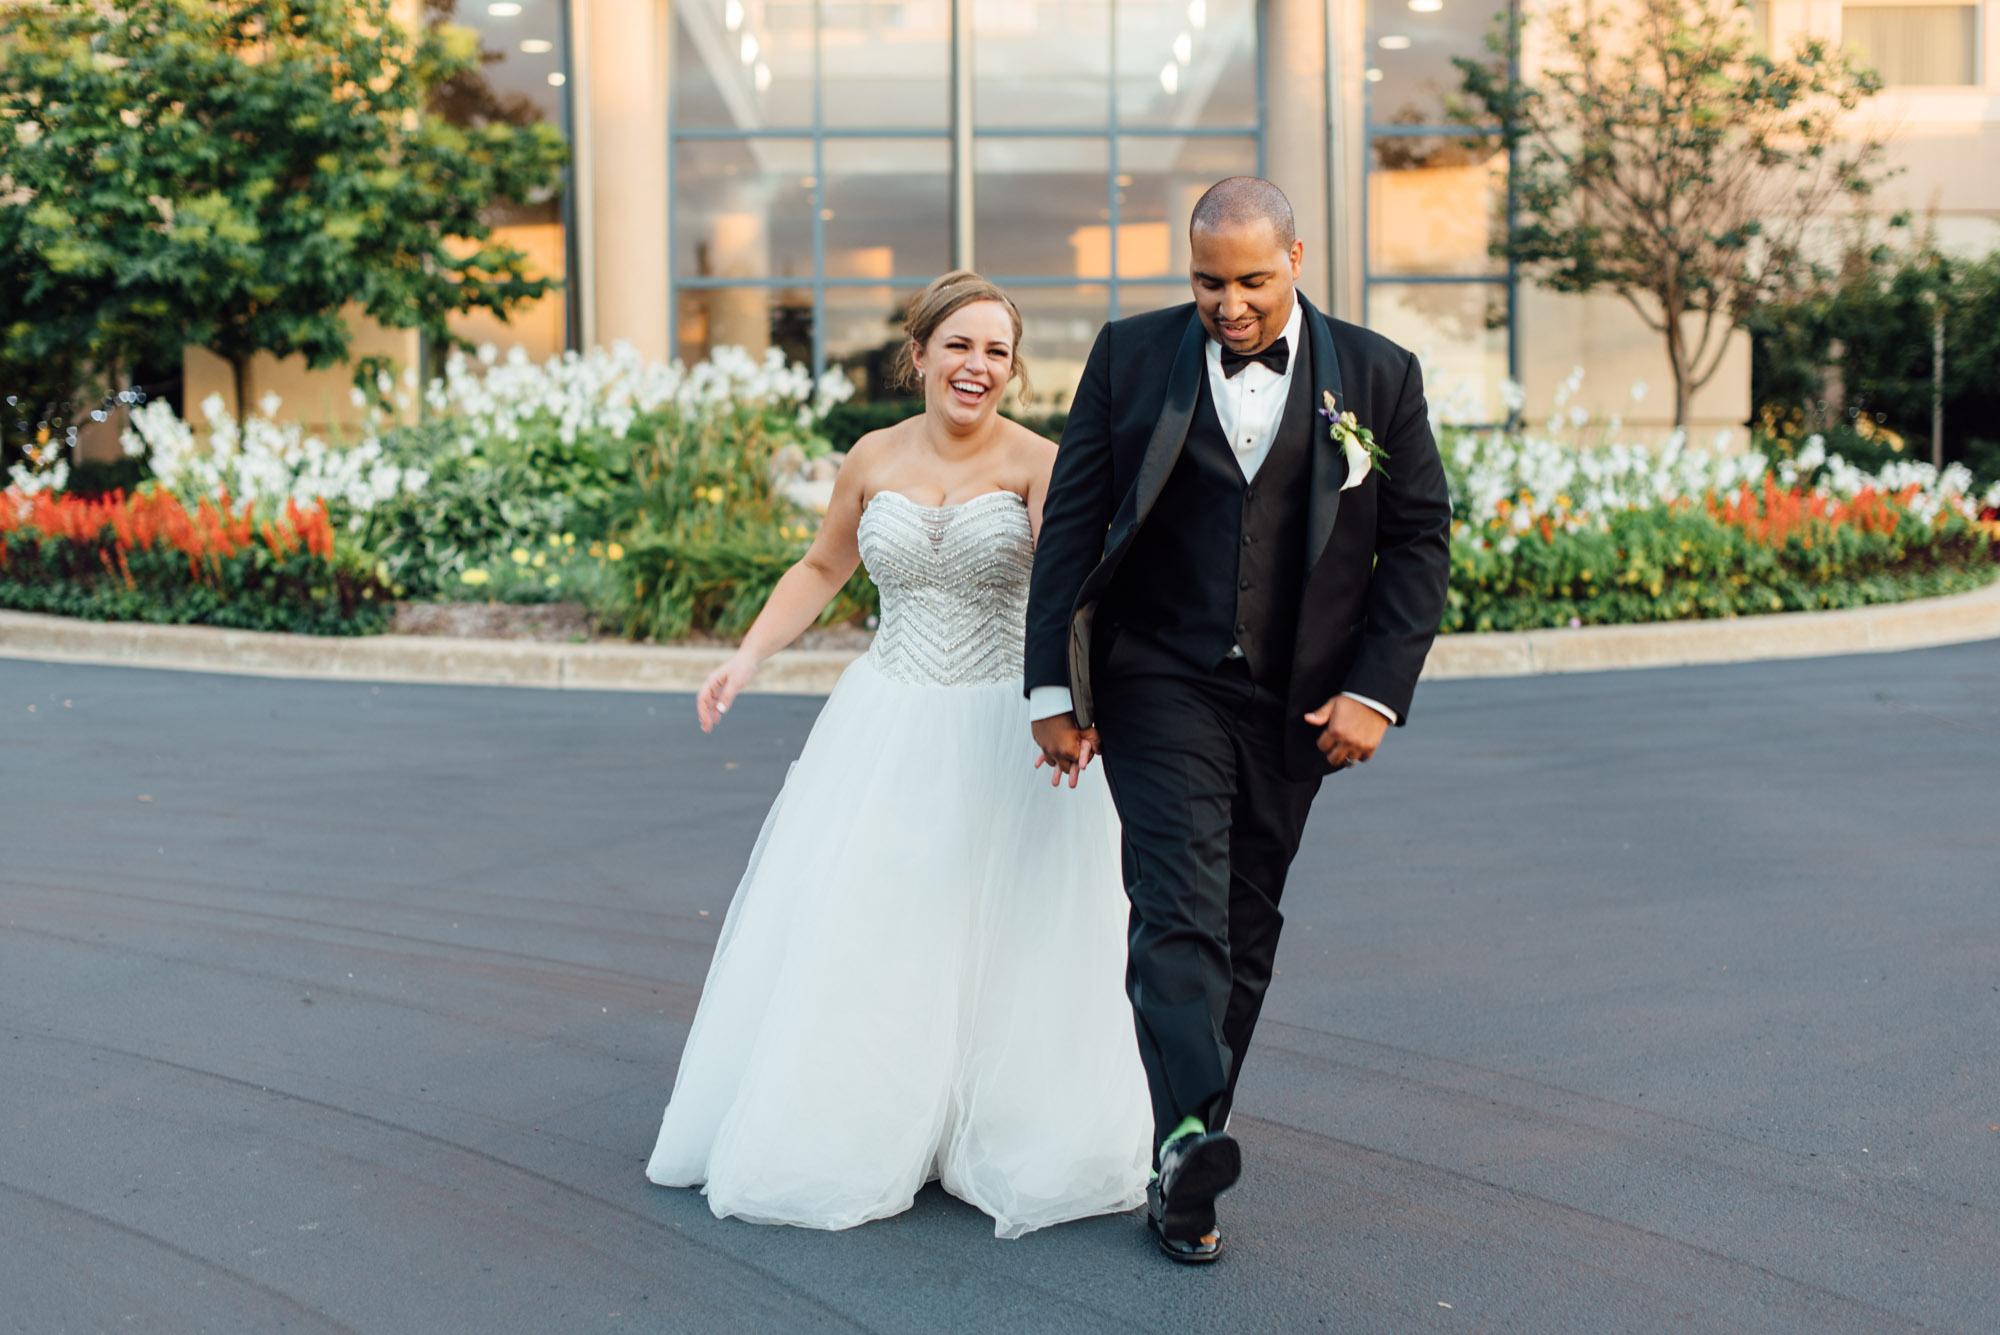 minneapolis-wedding-photographer-1-3.jpg